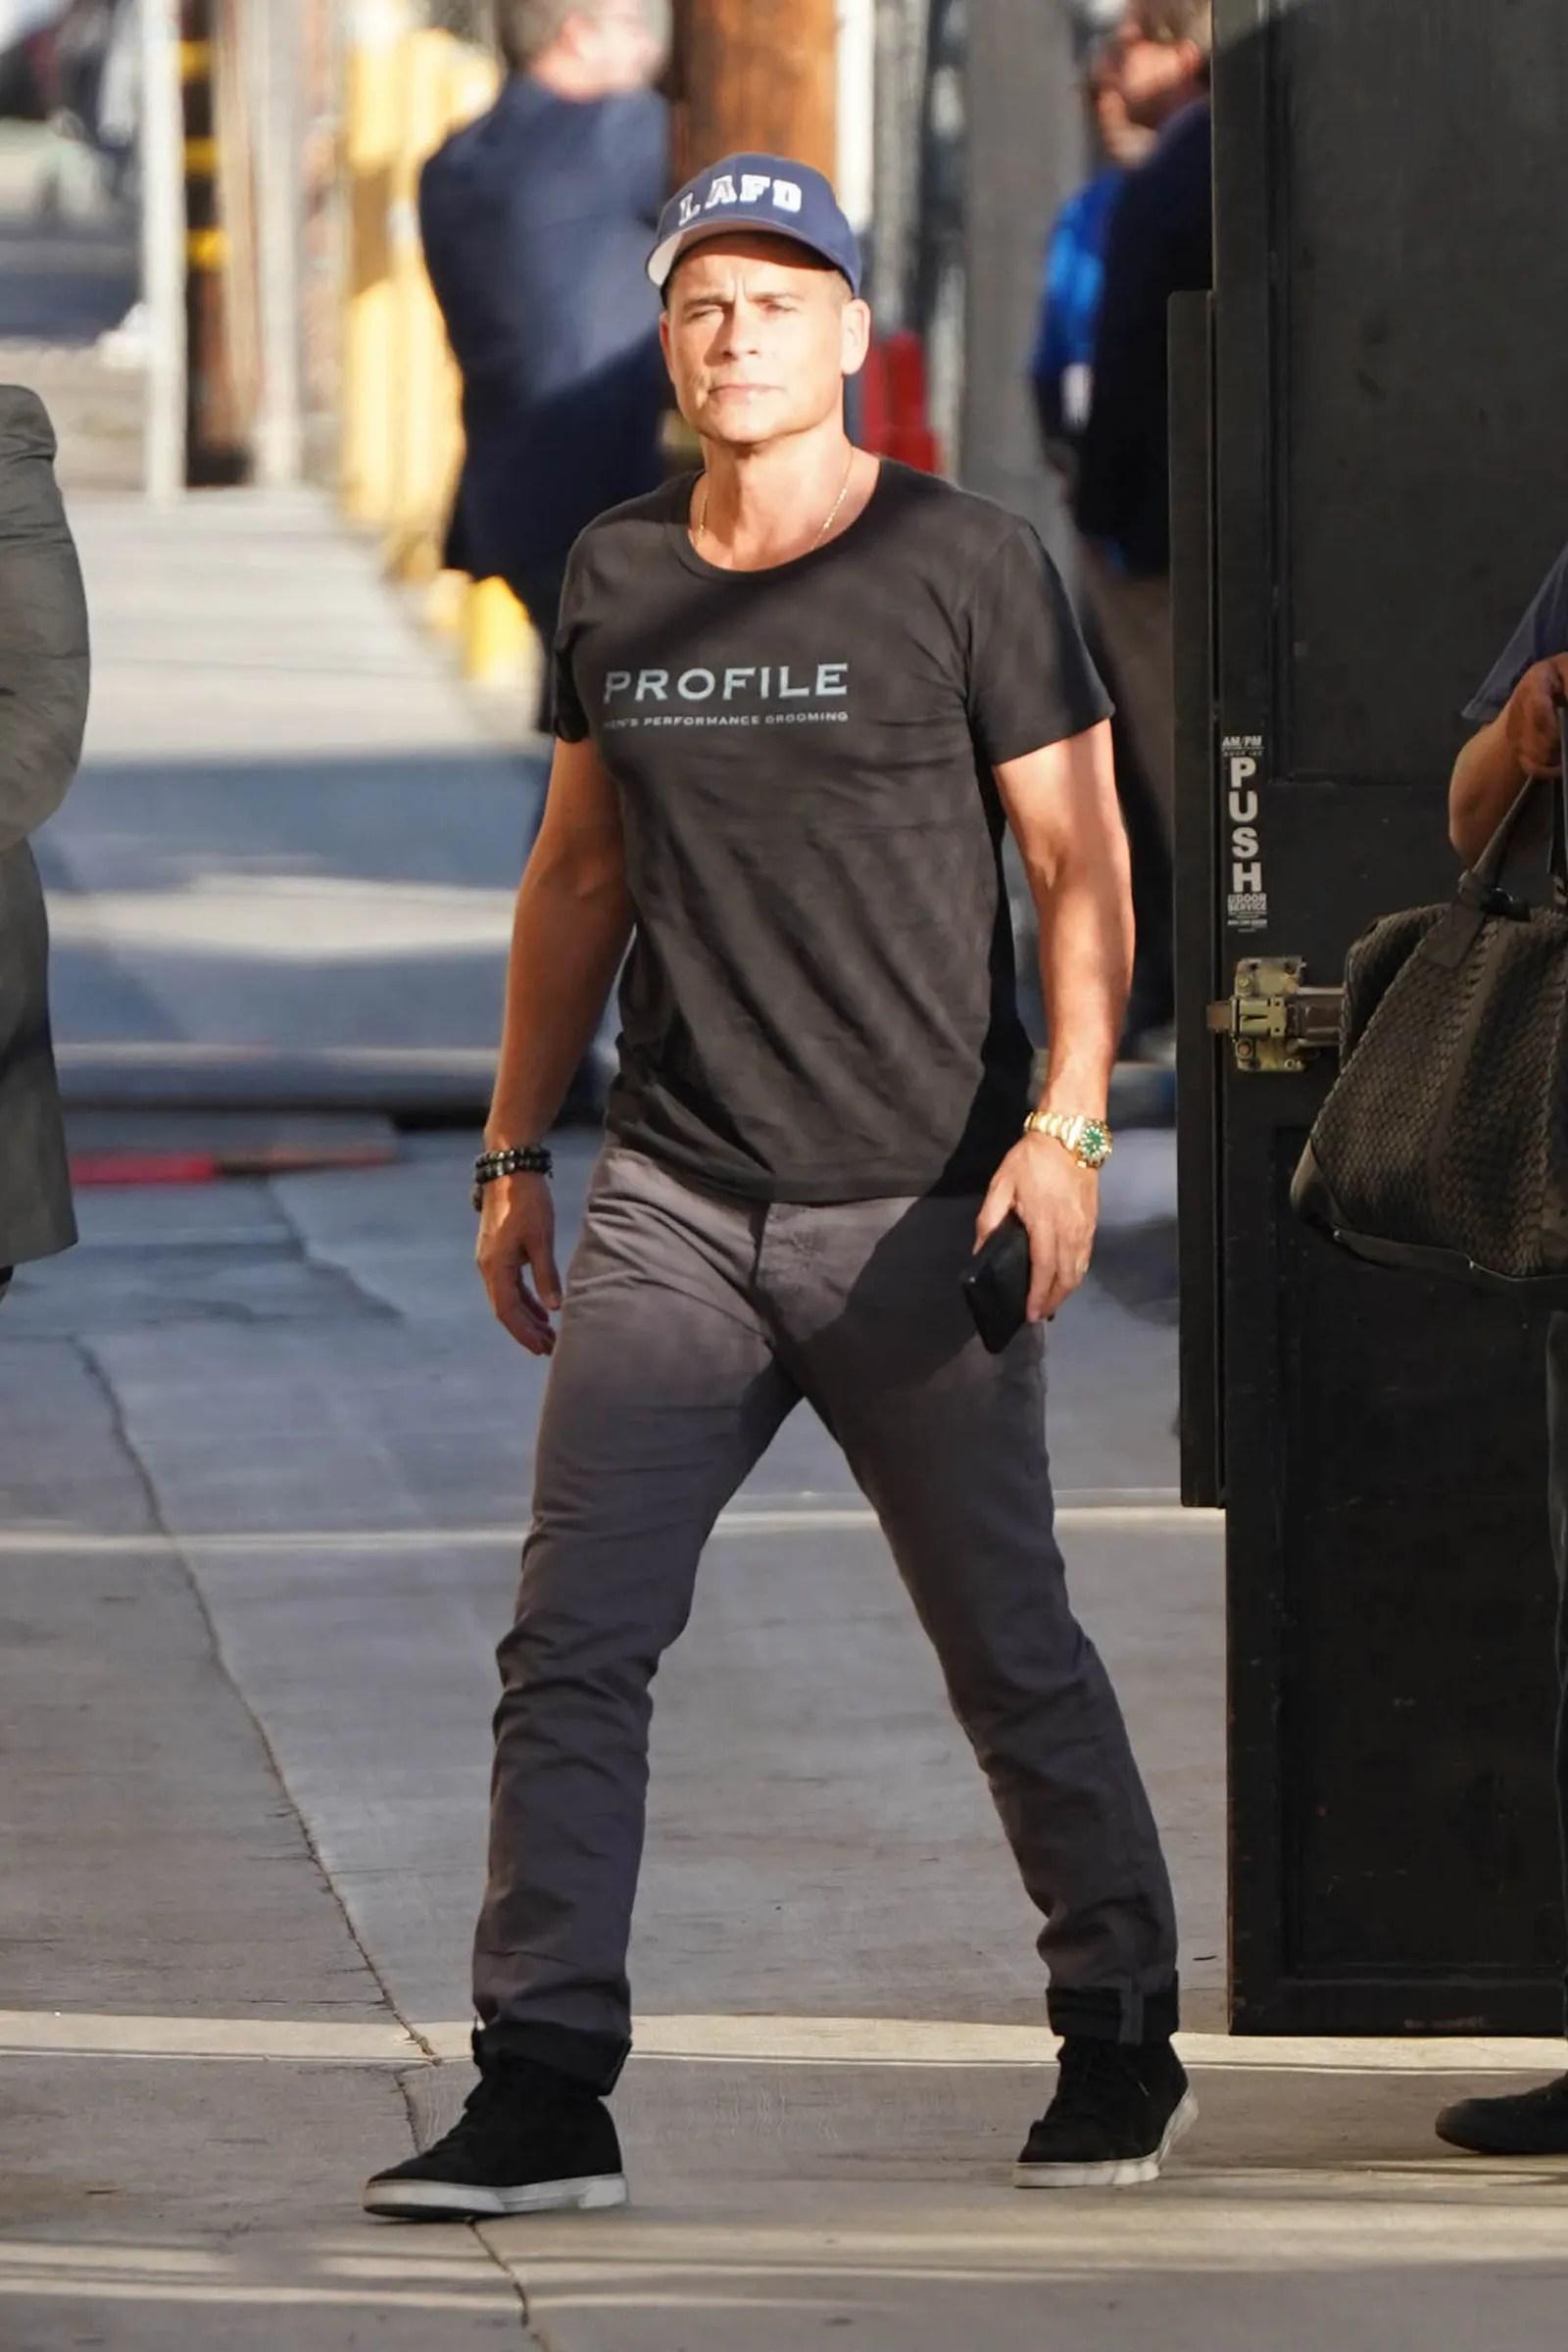 LOS ANGELES CA OCTOBER 30 Rob Lowe is seen on October 30 2019 in Los Angeles California.